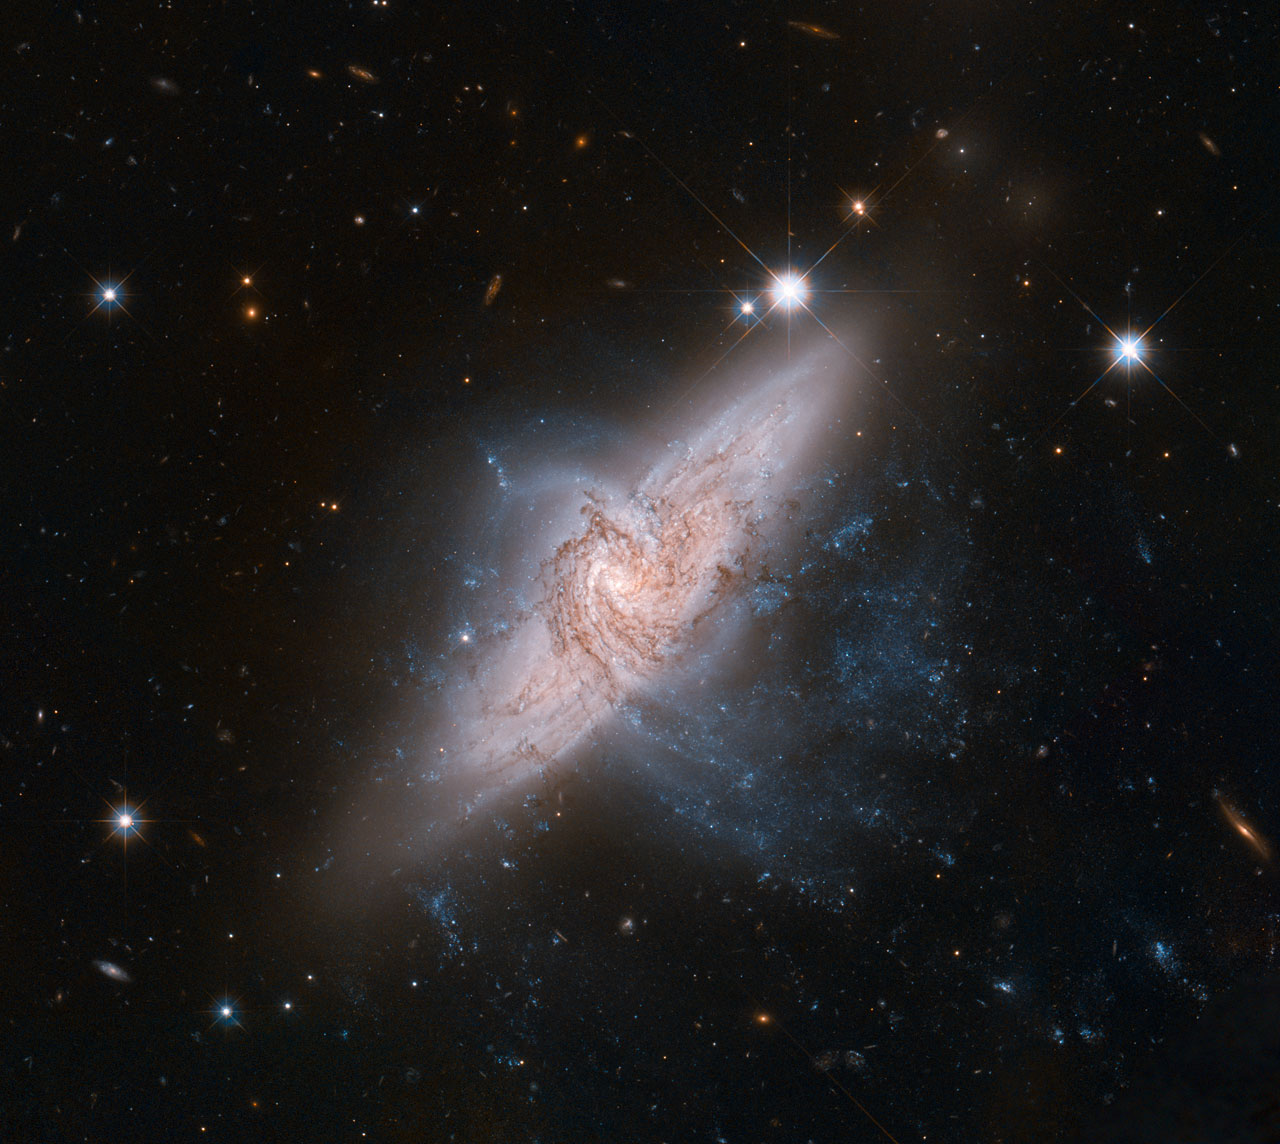 Фото: NASA, ESA, the Hubble Heritage (STScI/AURA)-ESA/Hubble Collaboration, and W. Keel (University of Alabama)